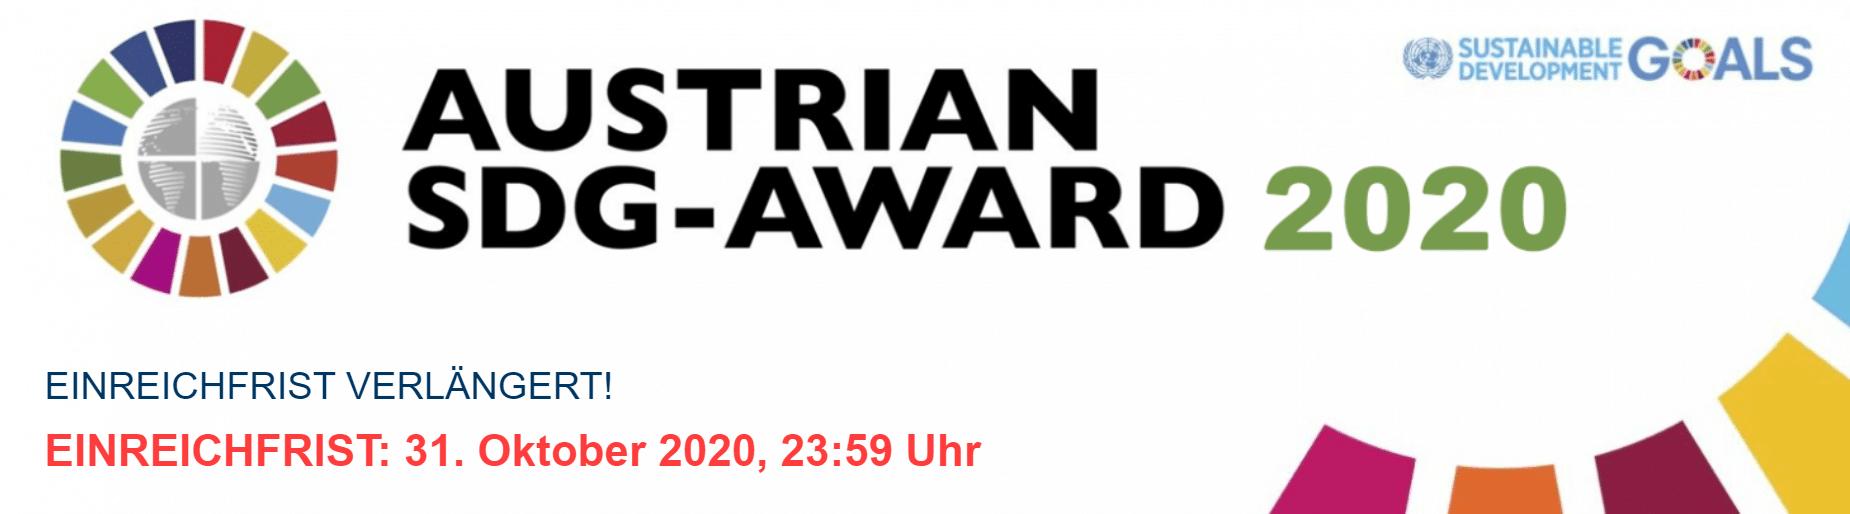 SDG Award 2020